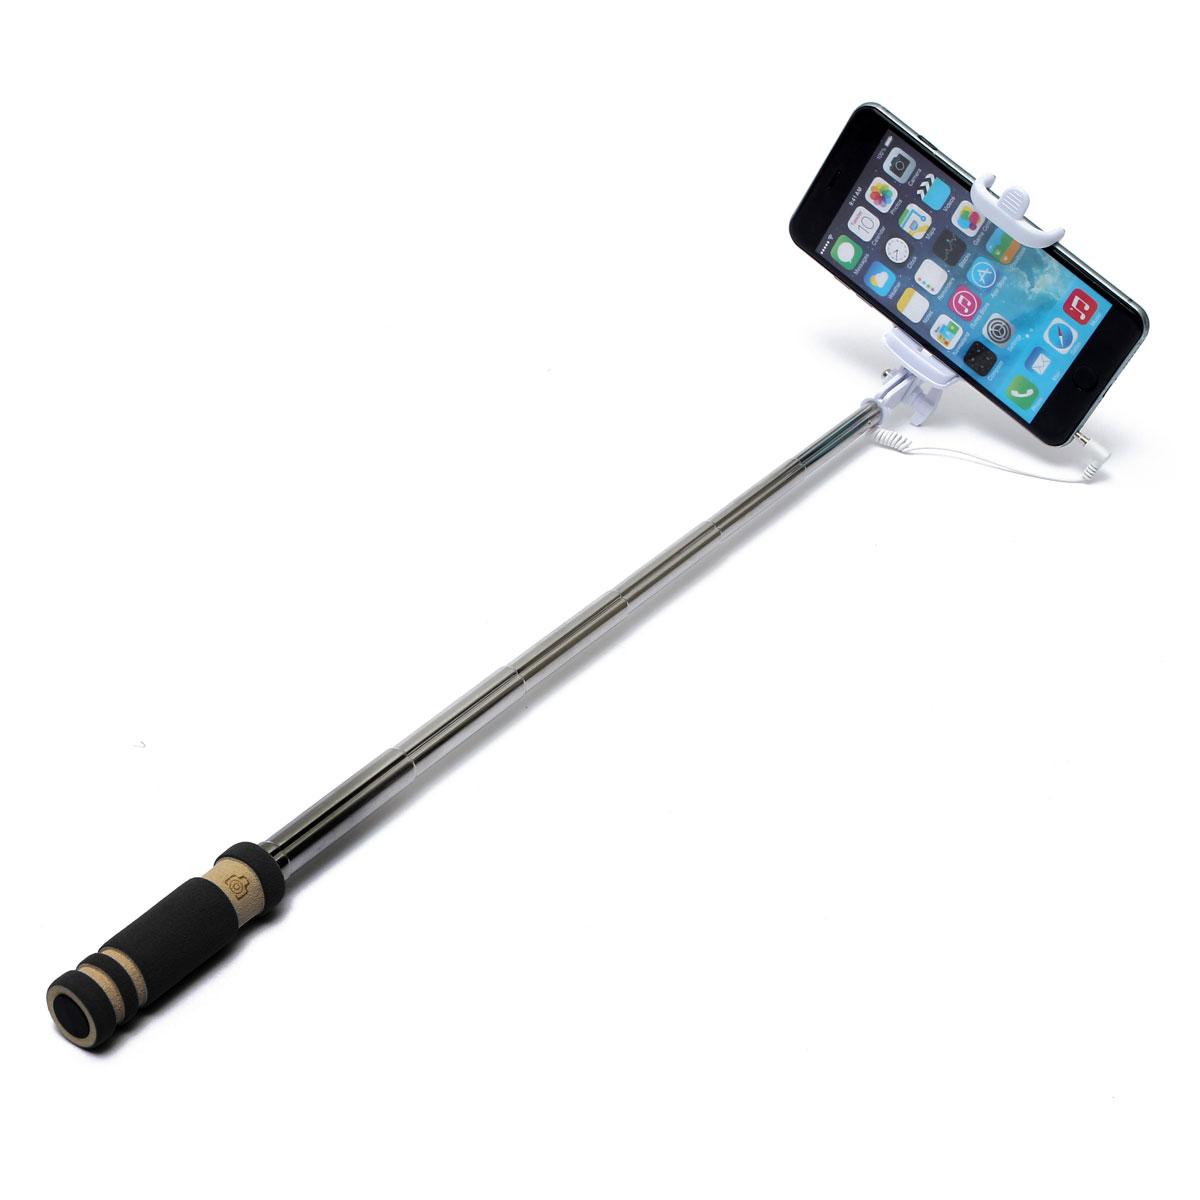 extendable handheld selfie stick wired remote shutter monopod for phone black lazada singapore. Black Bedroom Furniture Sets. Home Design Ideas